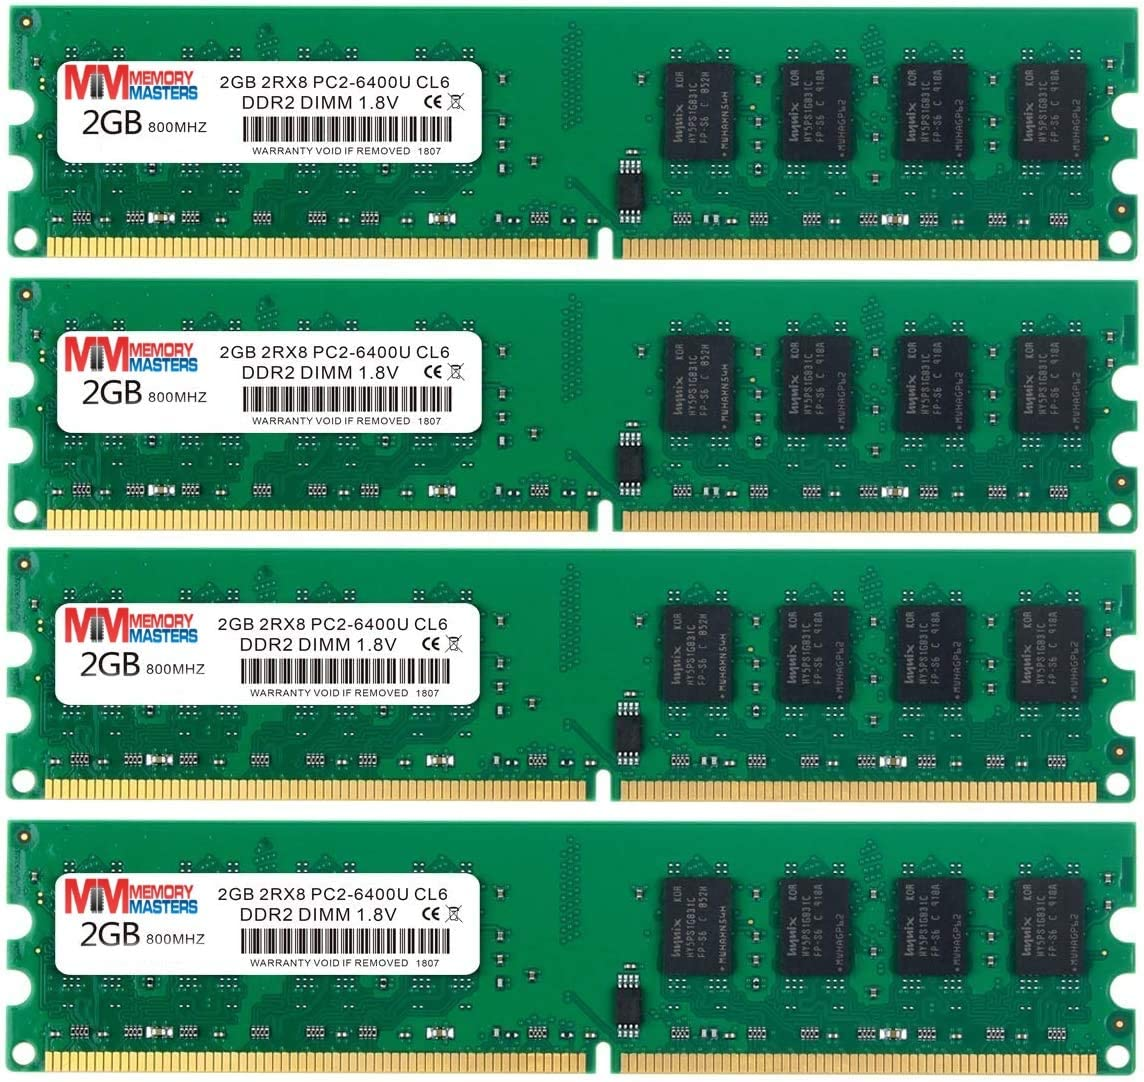 MemoryMasters DDR2 PC2-6400 PC2-6400U 800MHz, DDR2-800 2RX8 240-Pin DIMM Desktop Memory 8GB Kit (4x2GB)